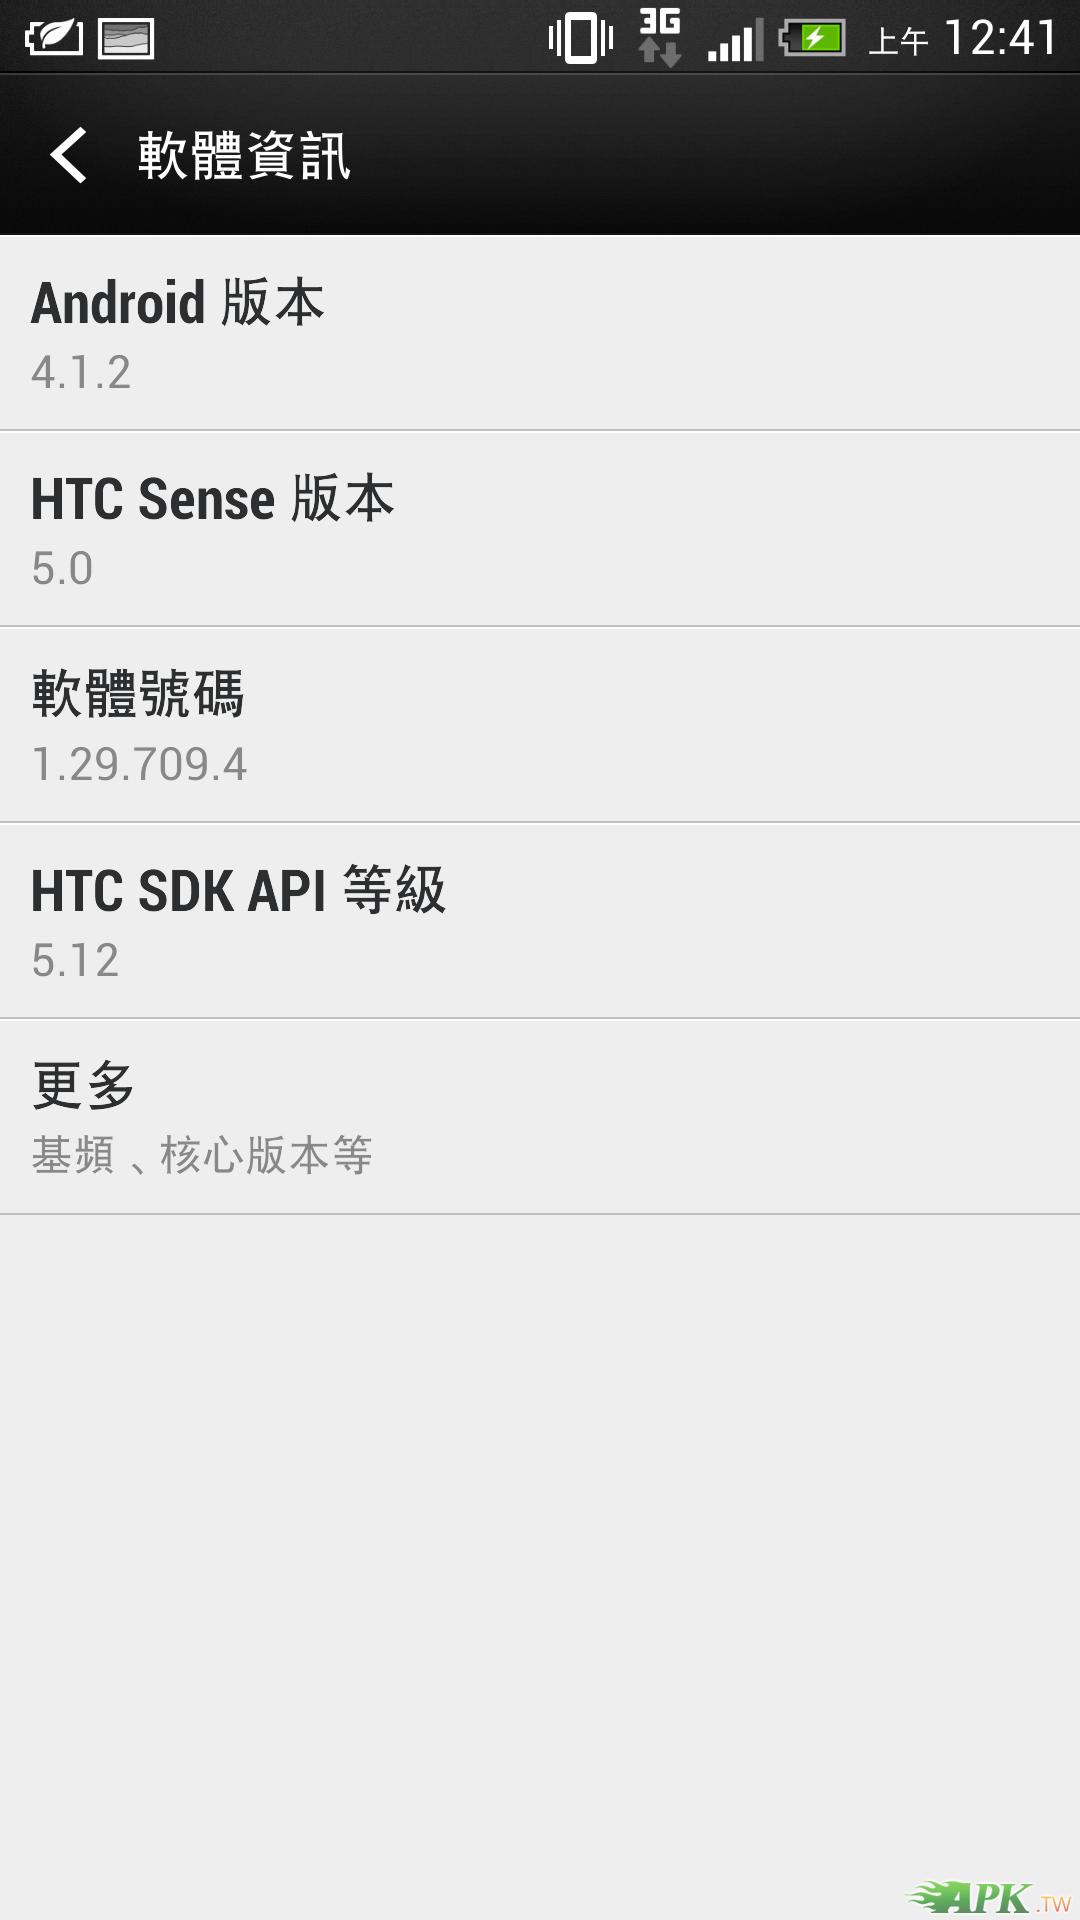 Screenshot_2013-03-31-00-41-27.png